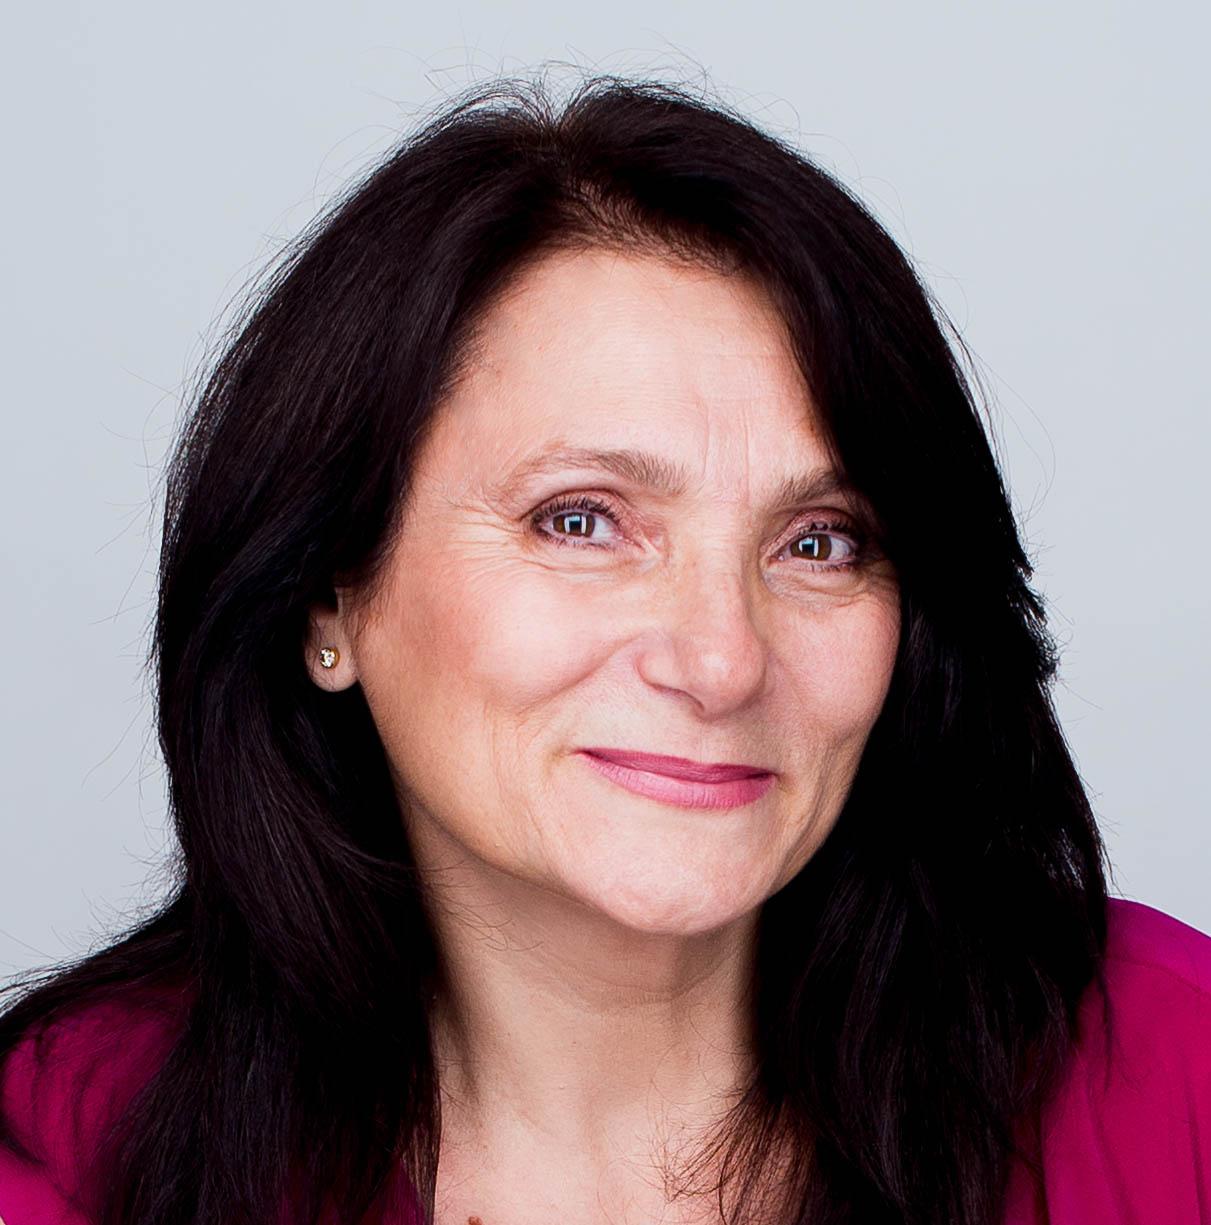 CarmelaVlacich